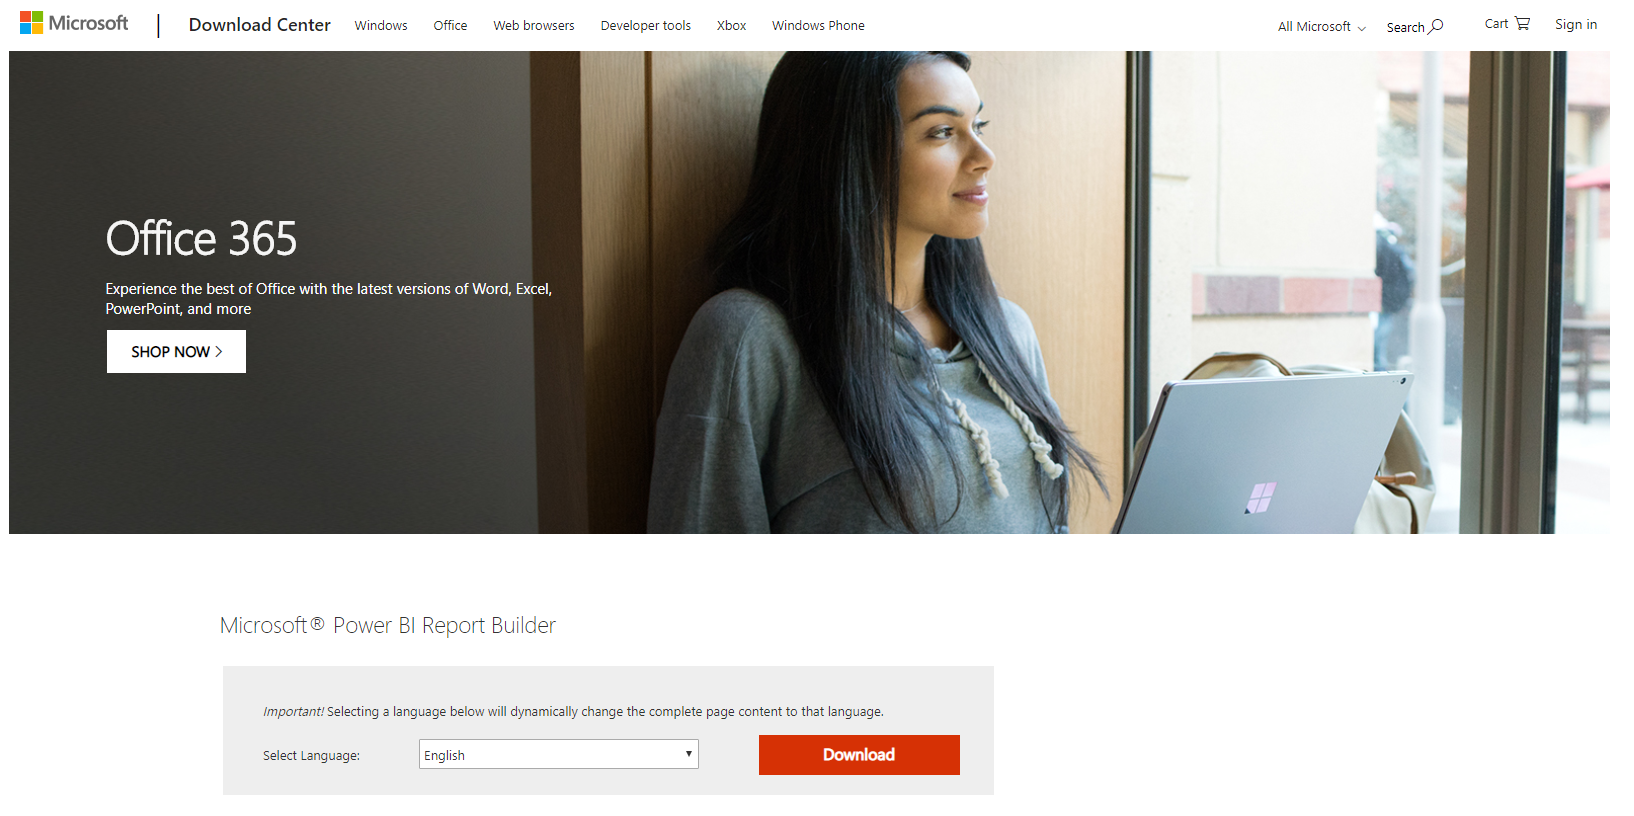 Downloading and Installing Power BI Report Builder - Carl de